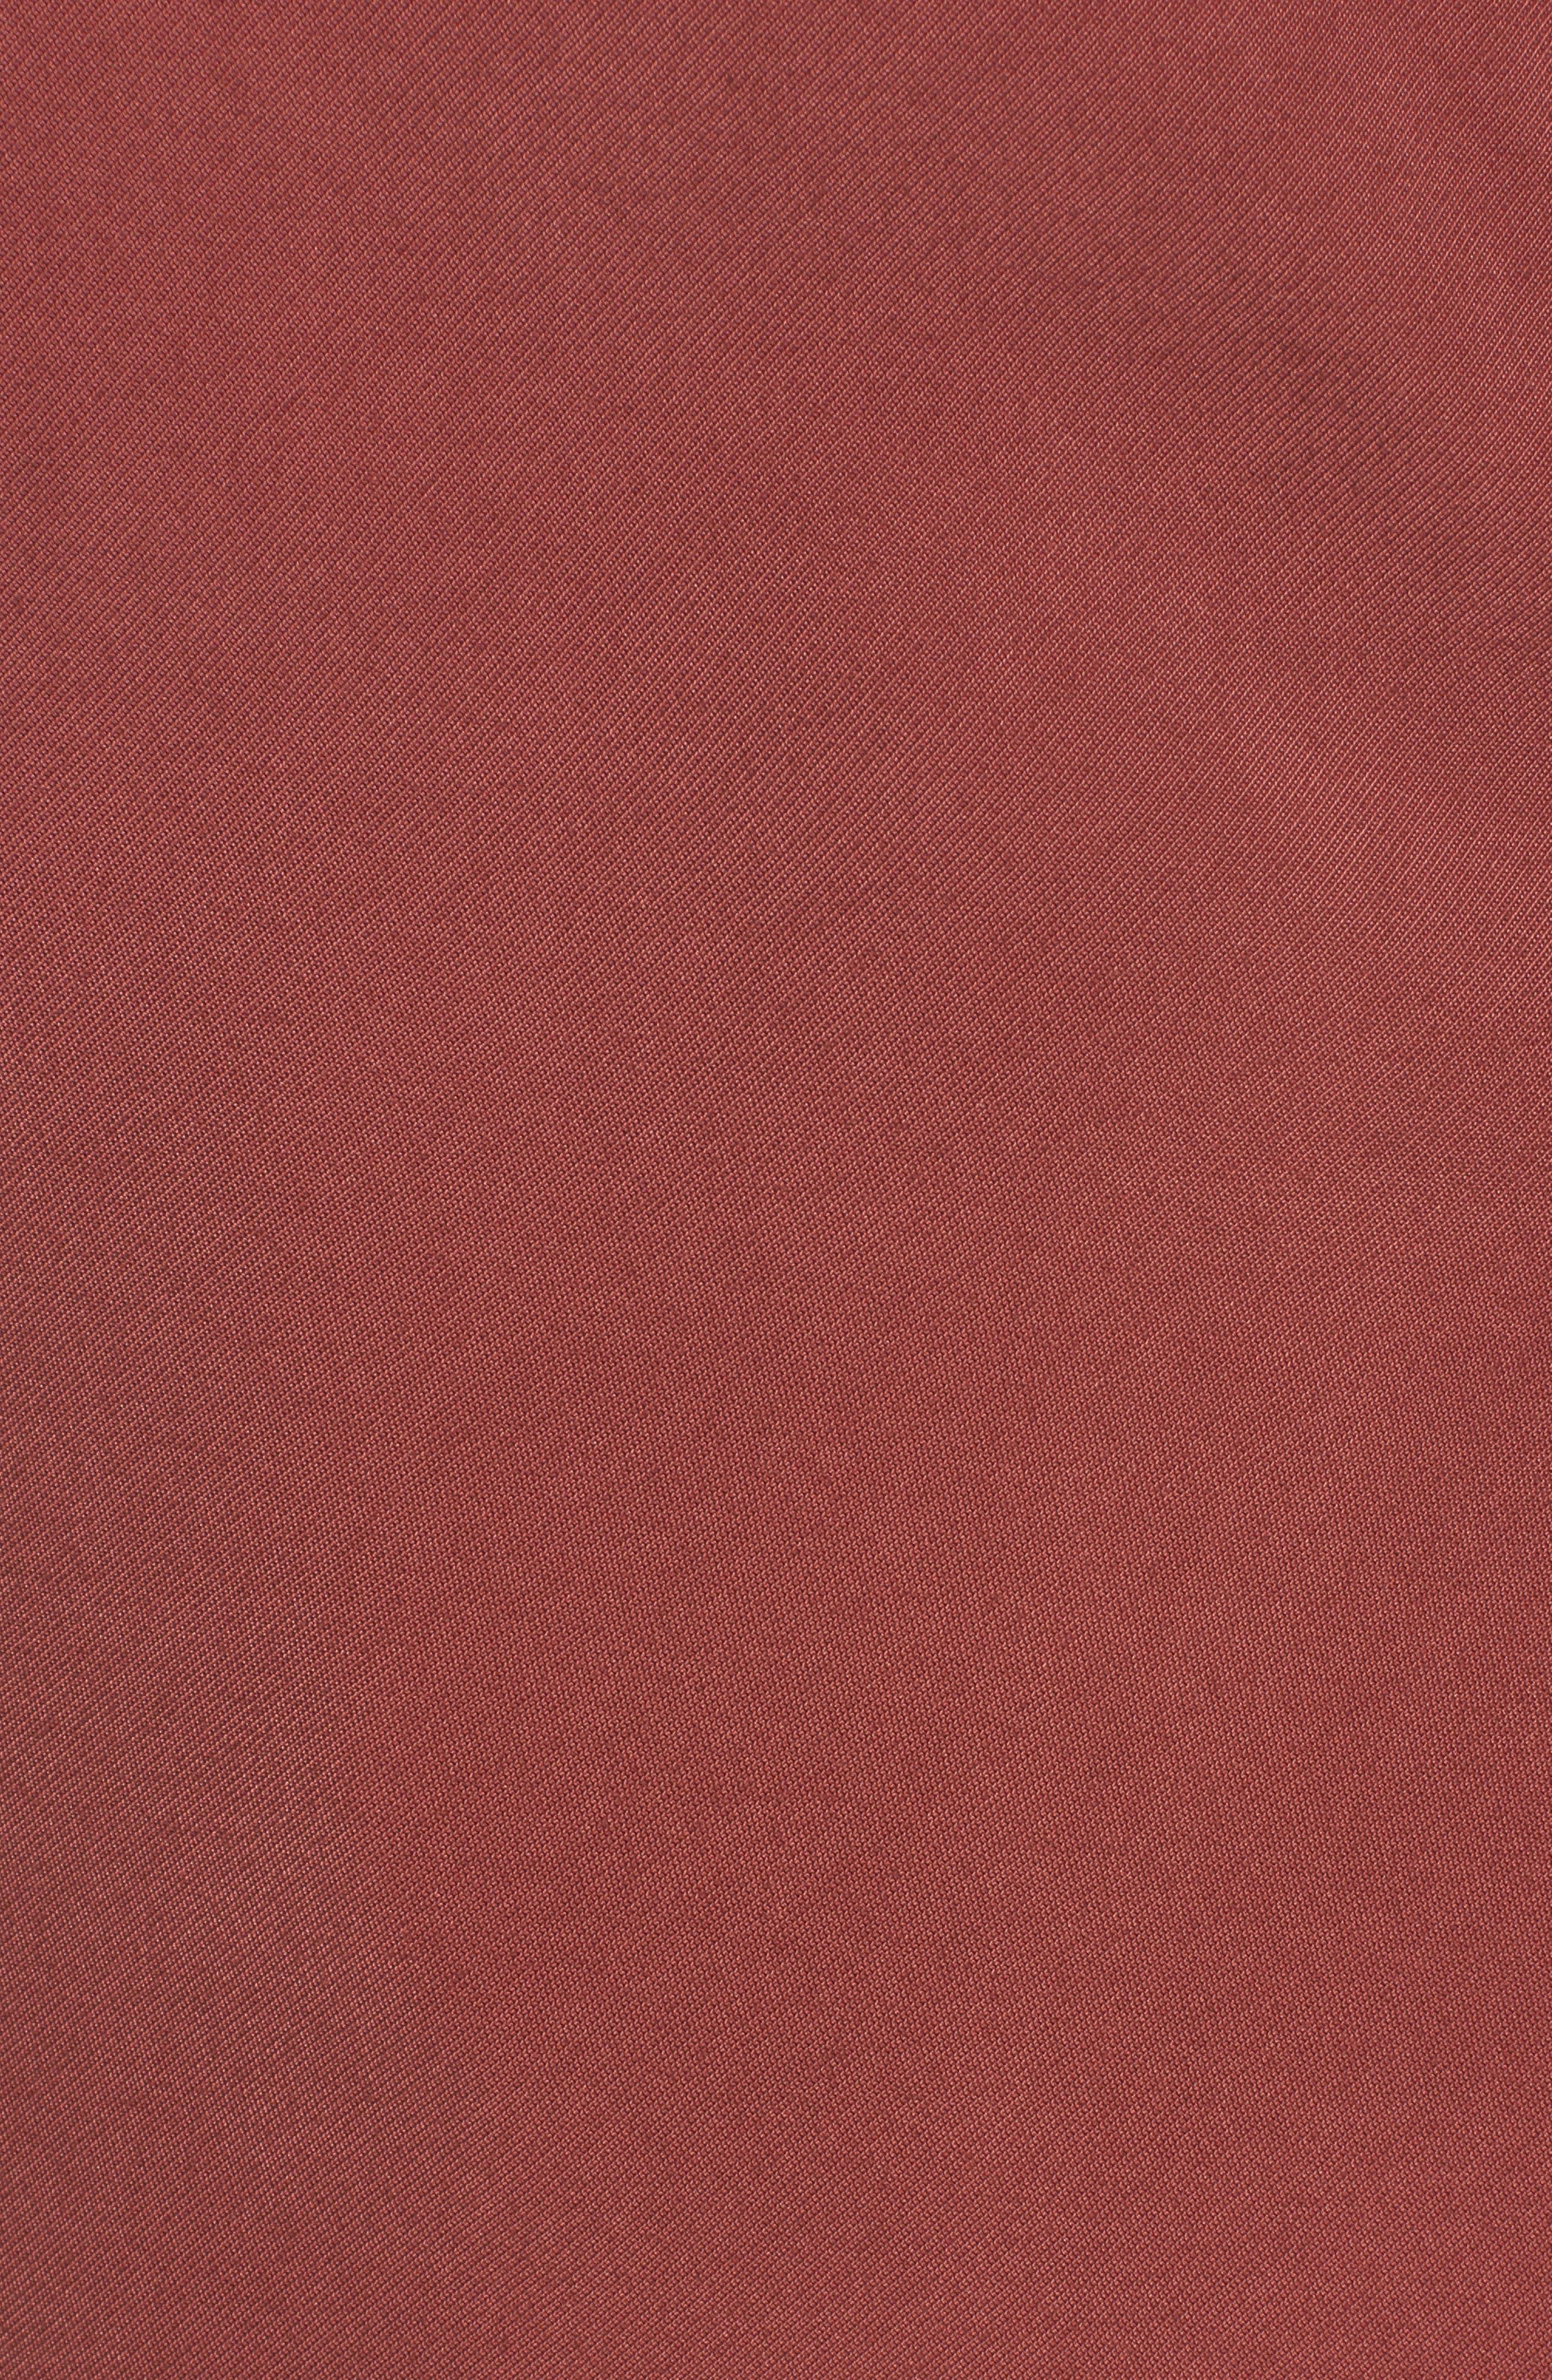 Alternate Image 5  - J.O.A. Side Tie Wrap Camisole